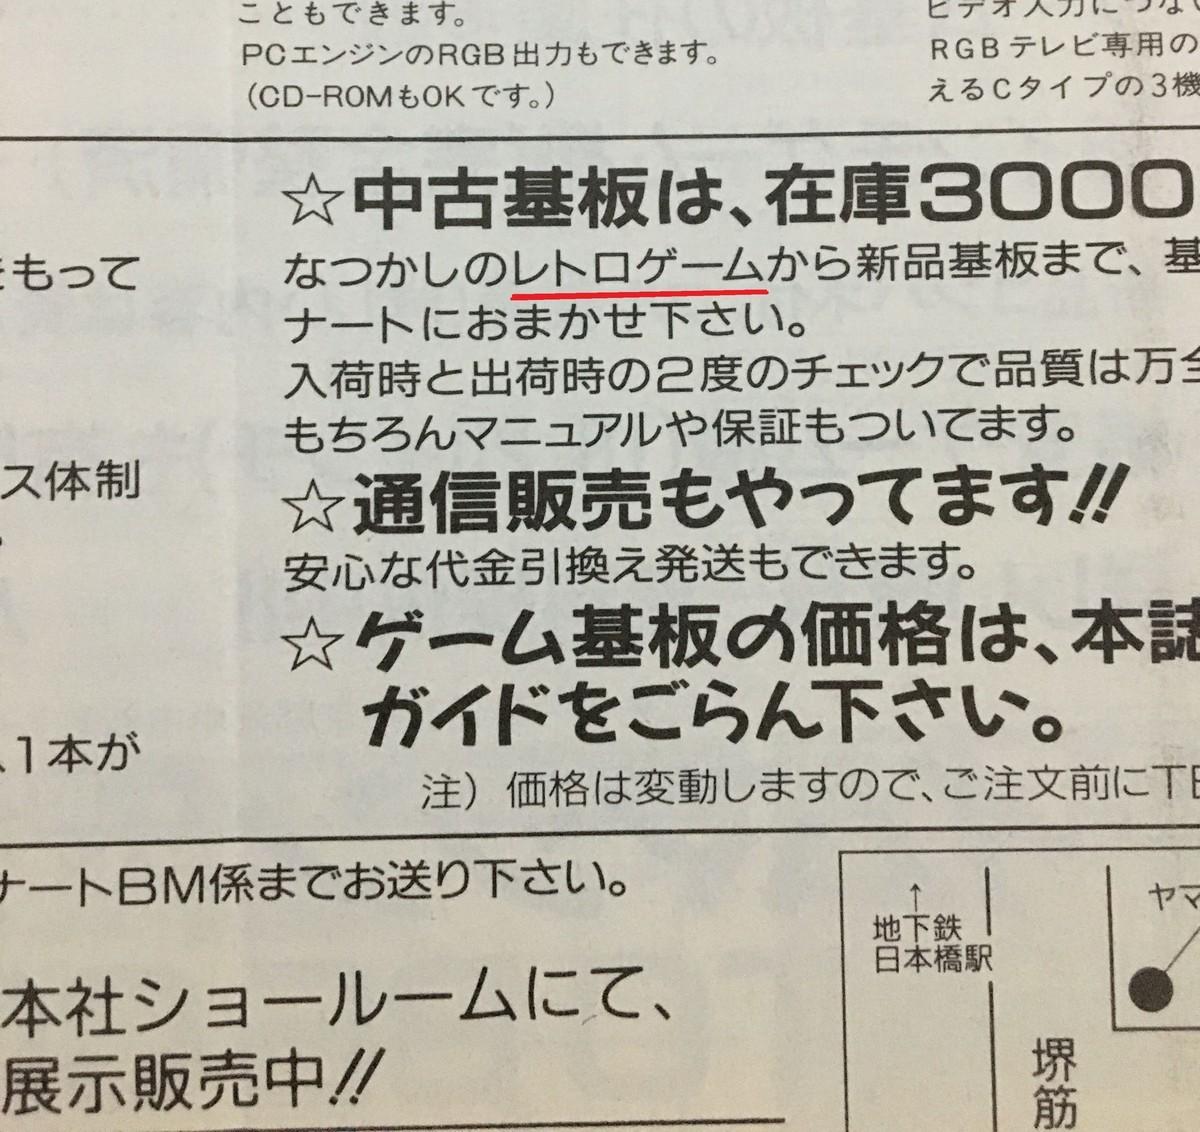 f:id:nicotakuya:20210111012459j:plain